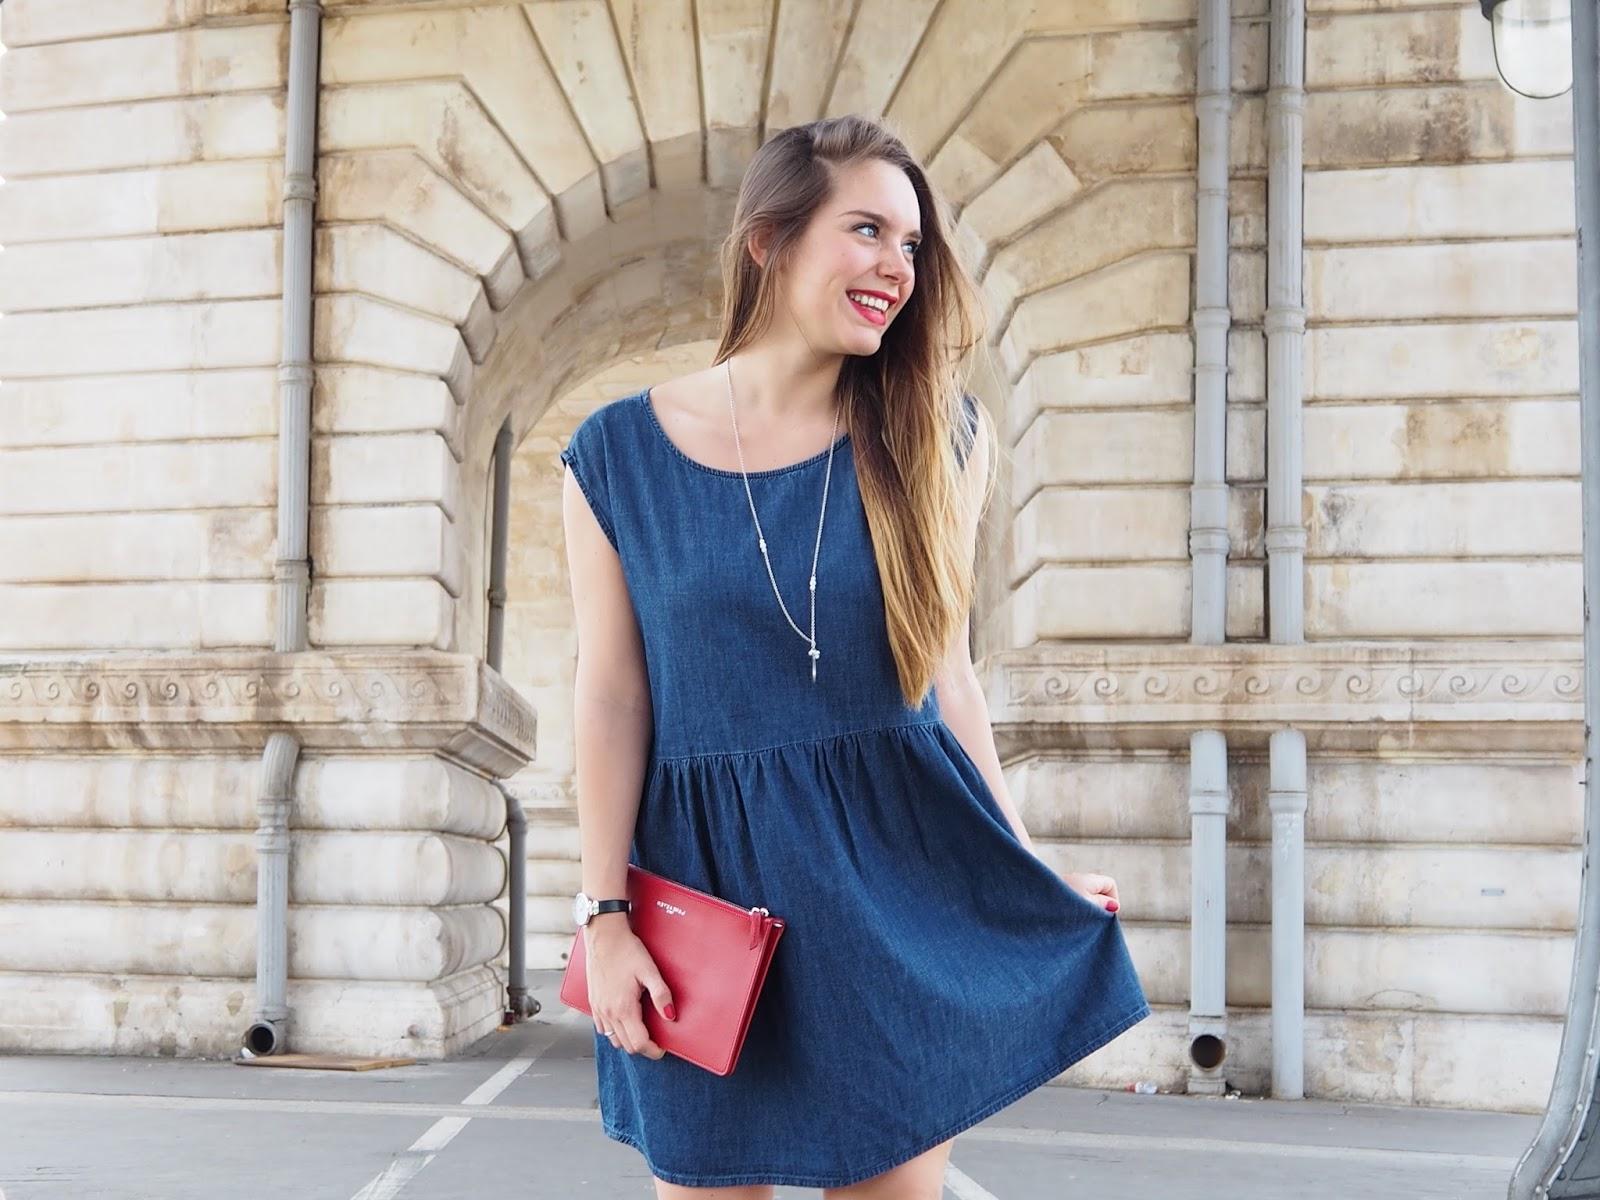 des petits hauts blogueuse mode